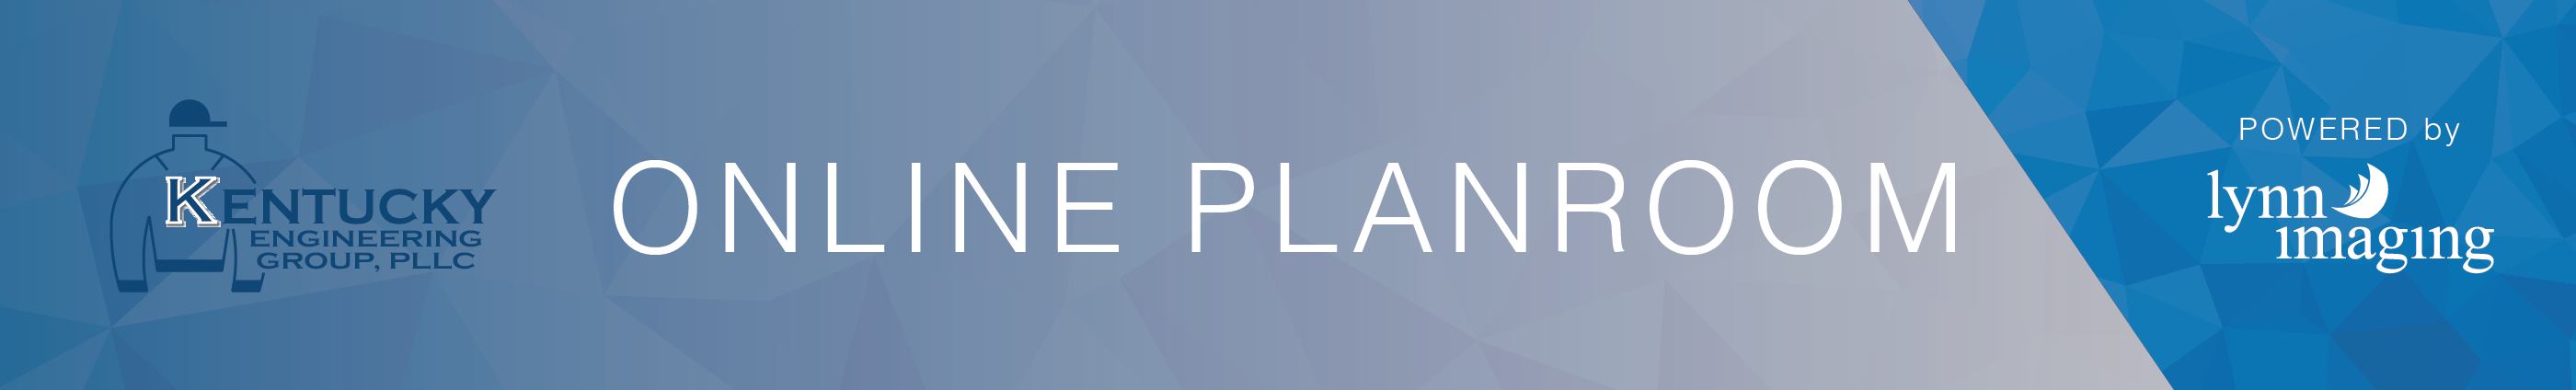 Kentucky Engineering Group Planroom